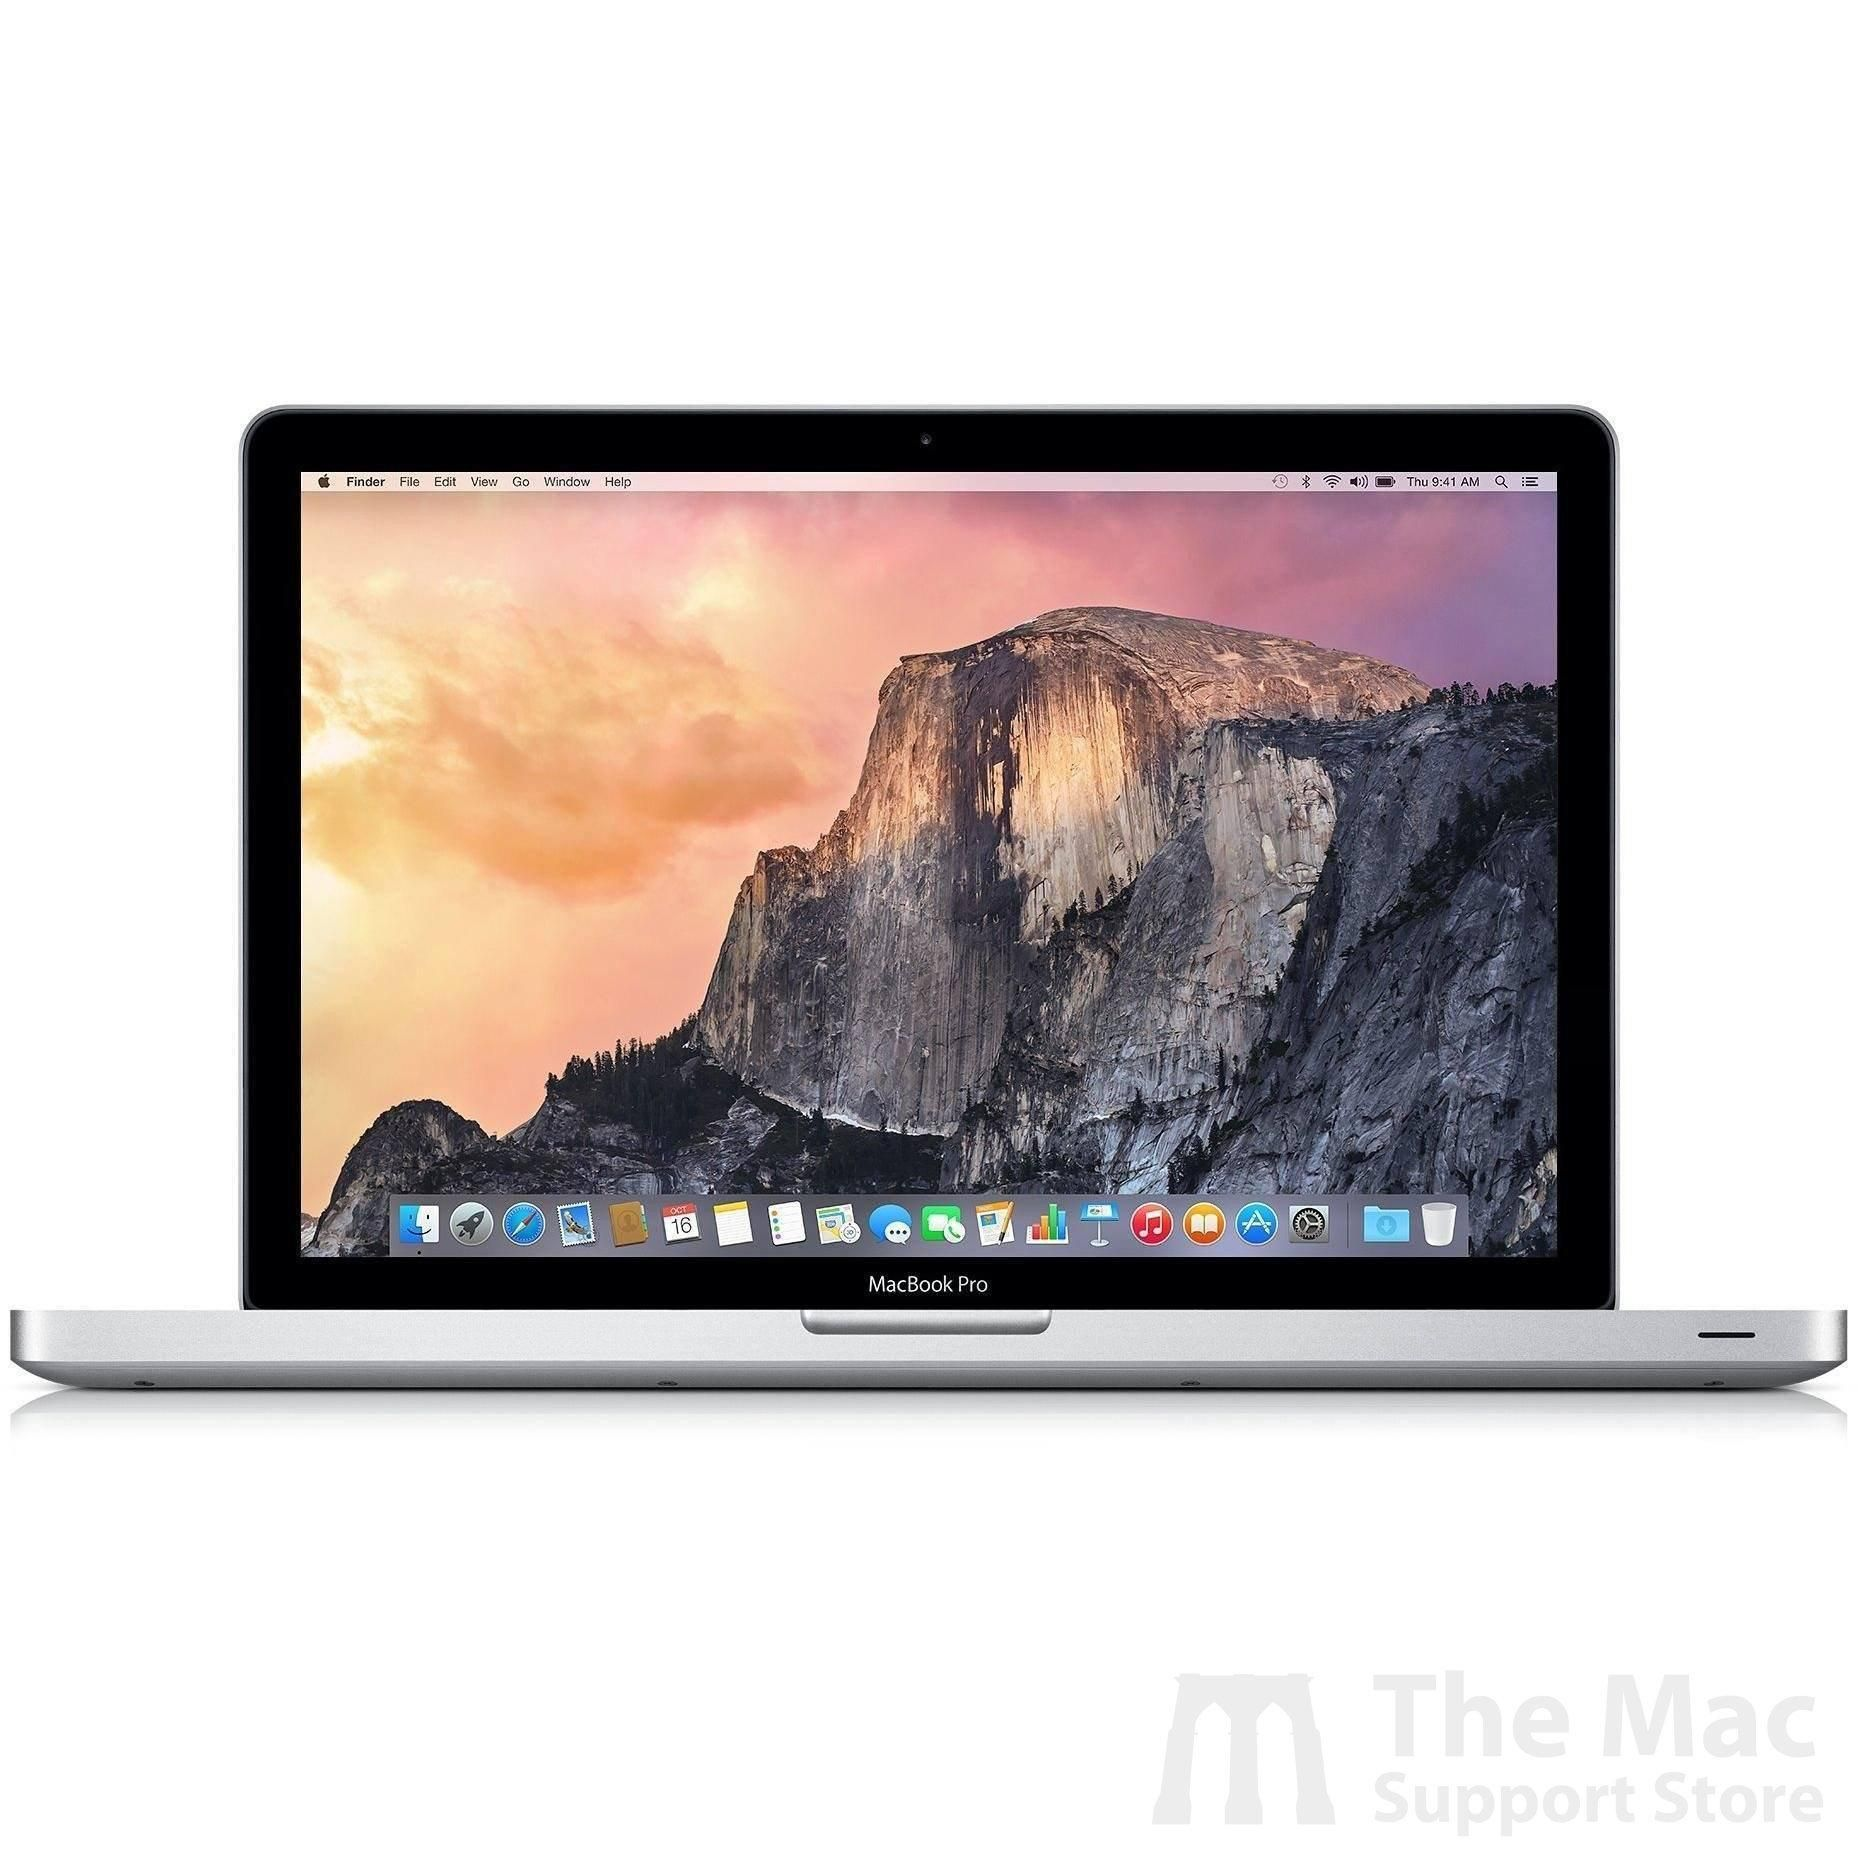 Rent MacBook Pro (15inch, Late 2011) in 2020 Macbook